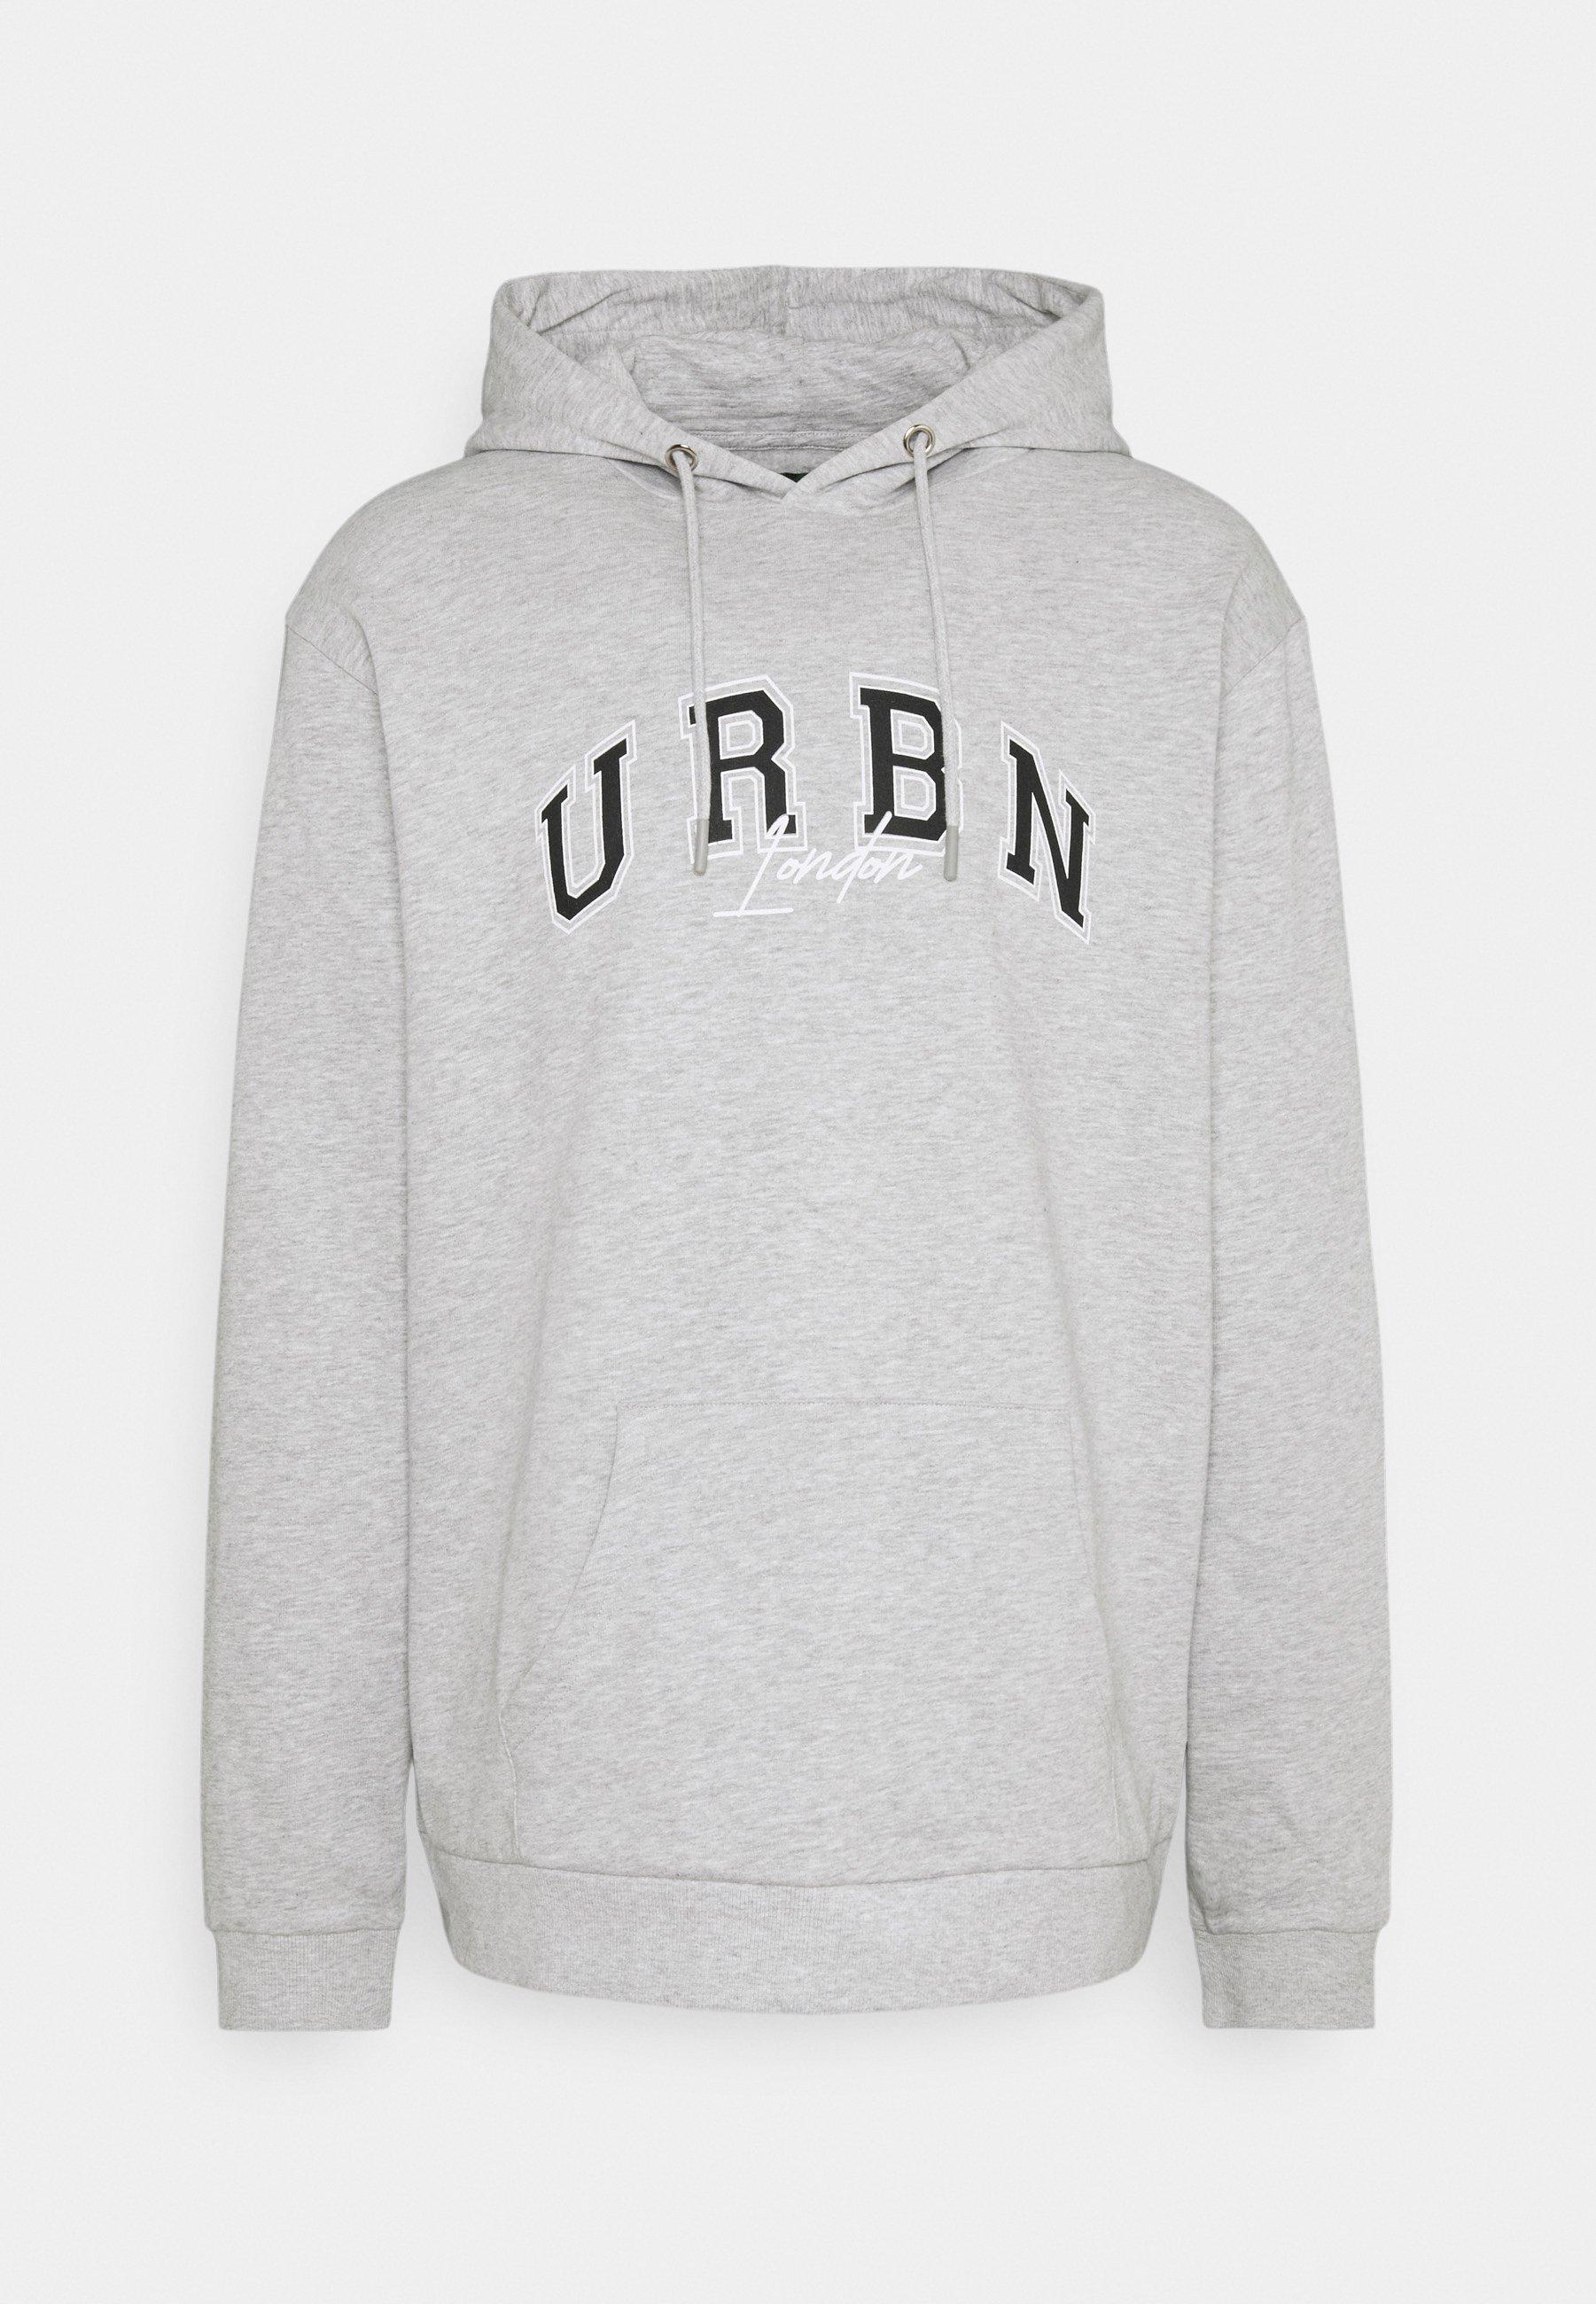 Homme EXTREME OVERSIZED HOODY UNISEX - Sweatshirt